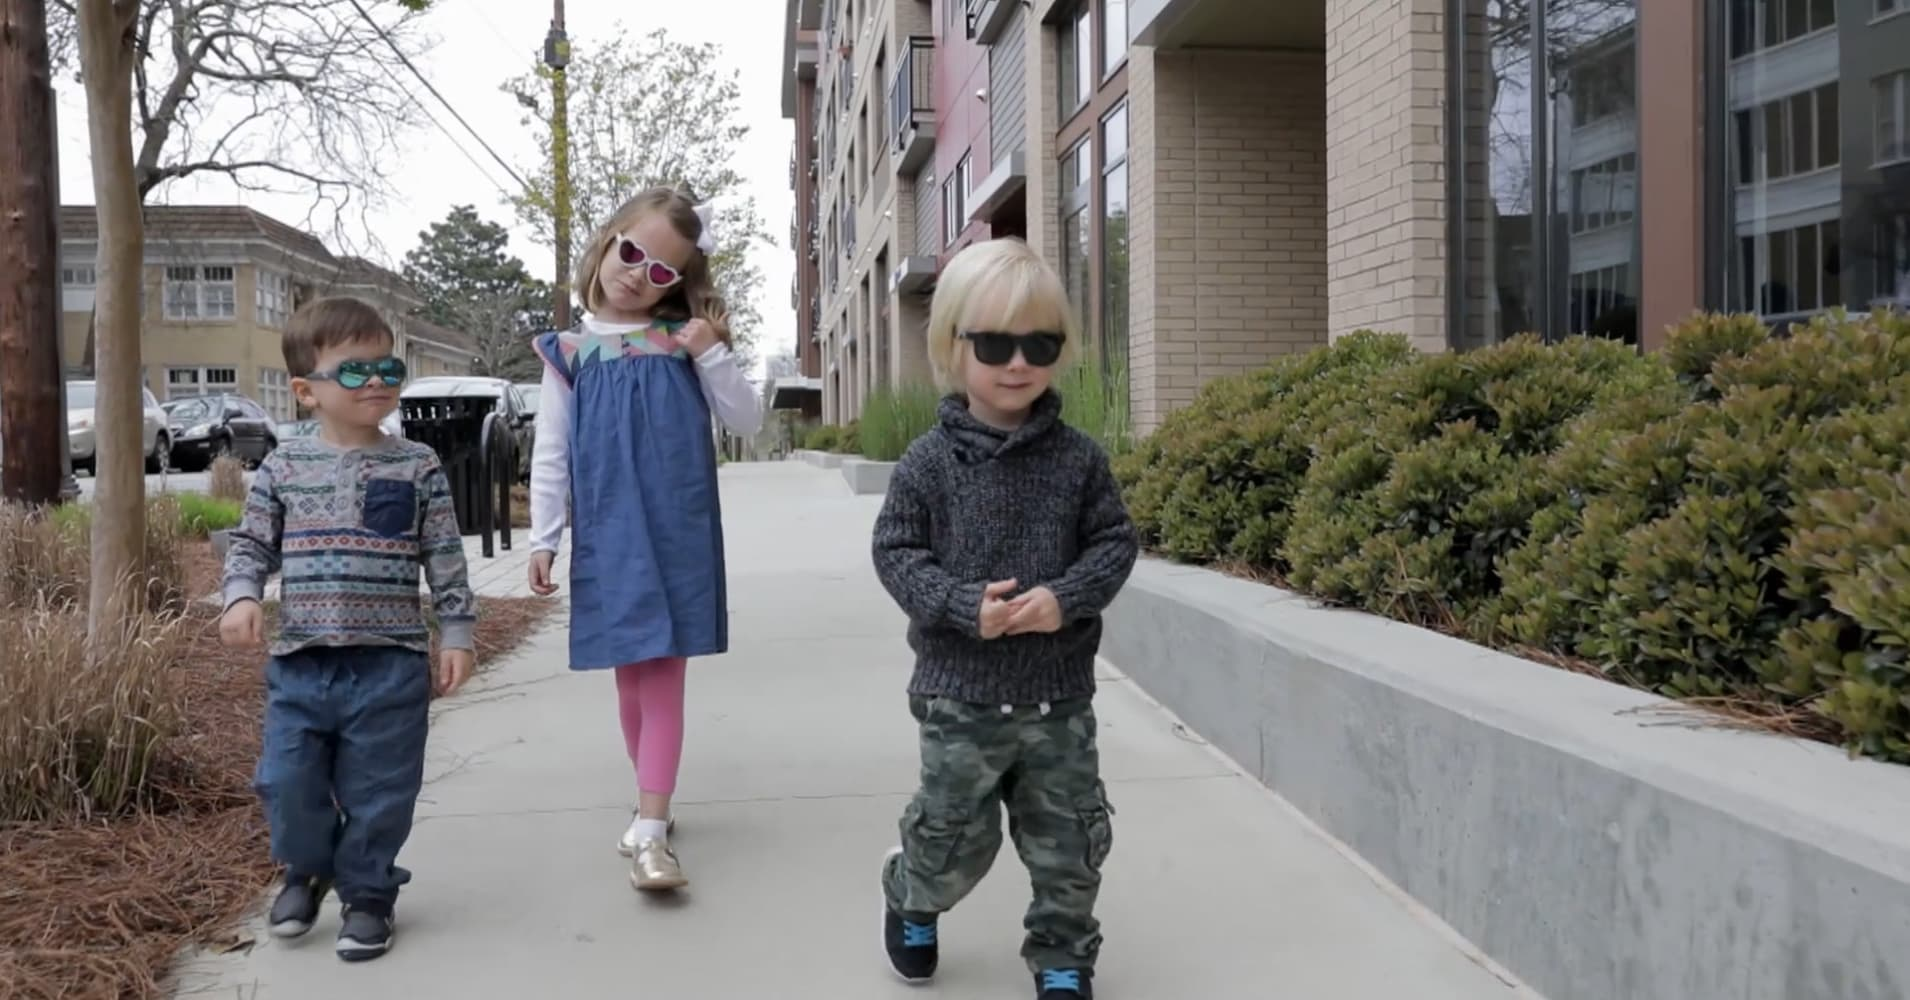 Some children try on Babiators